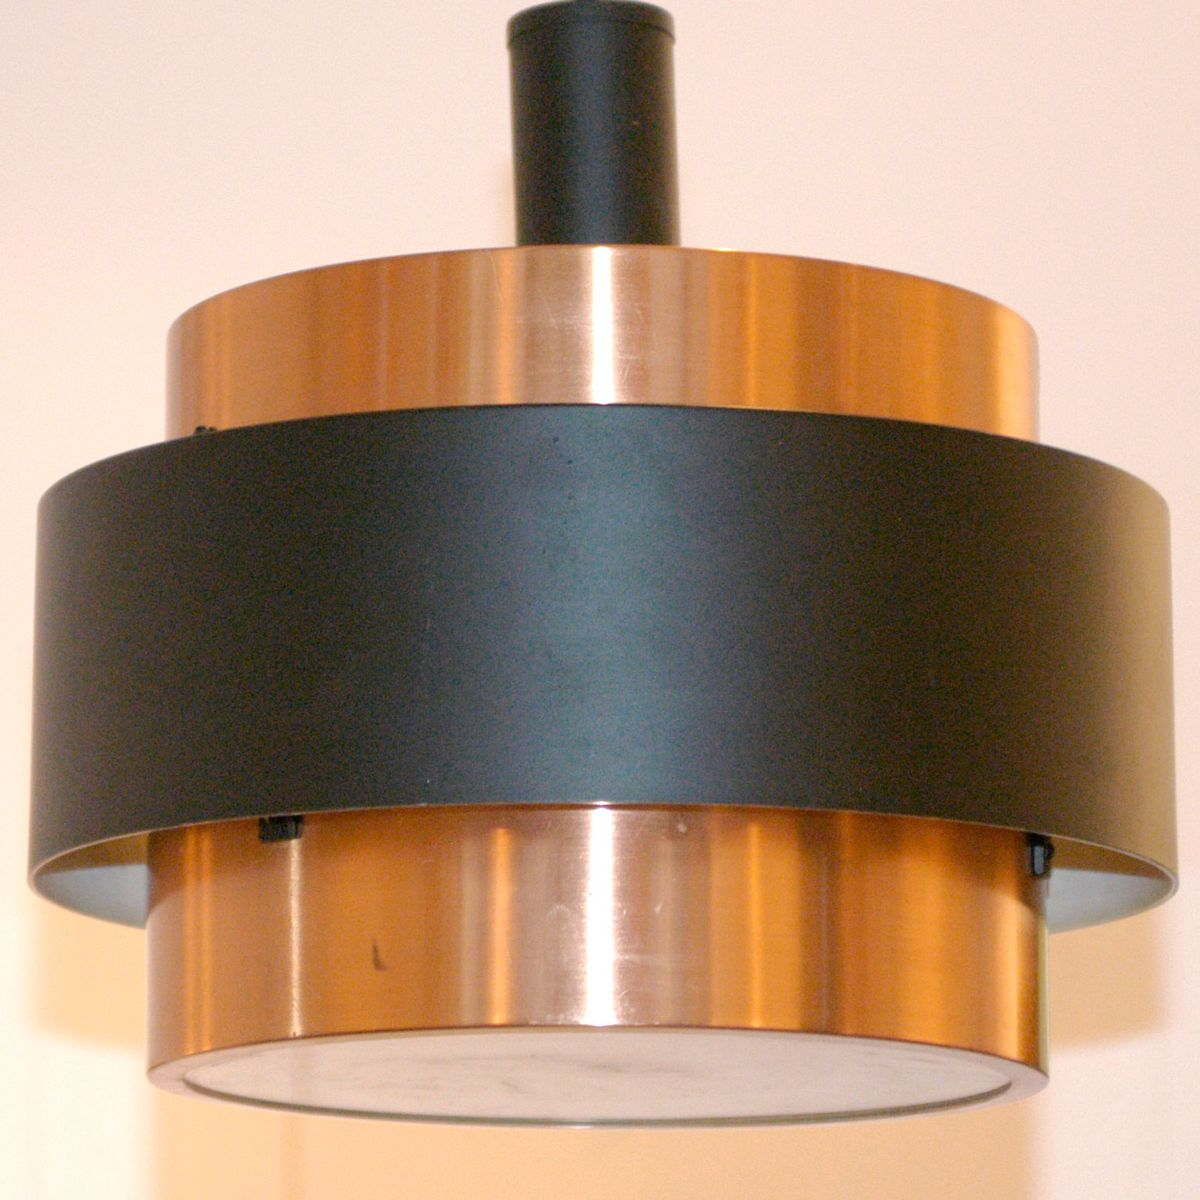 modell saturn h ngelampe aus kupfer von jo hammerborg f r. Black Bedroom Furniture Sets. Home Design Ideas